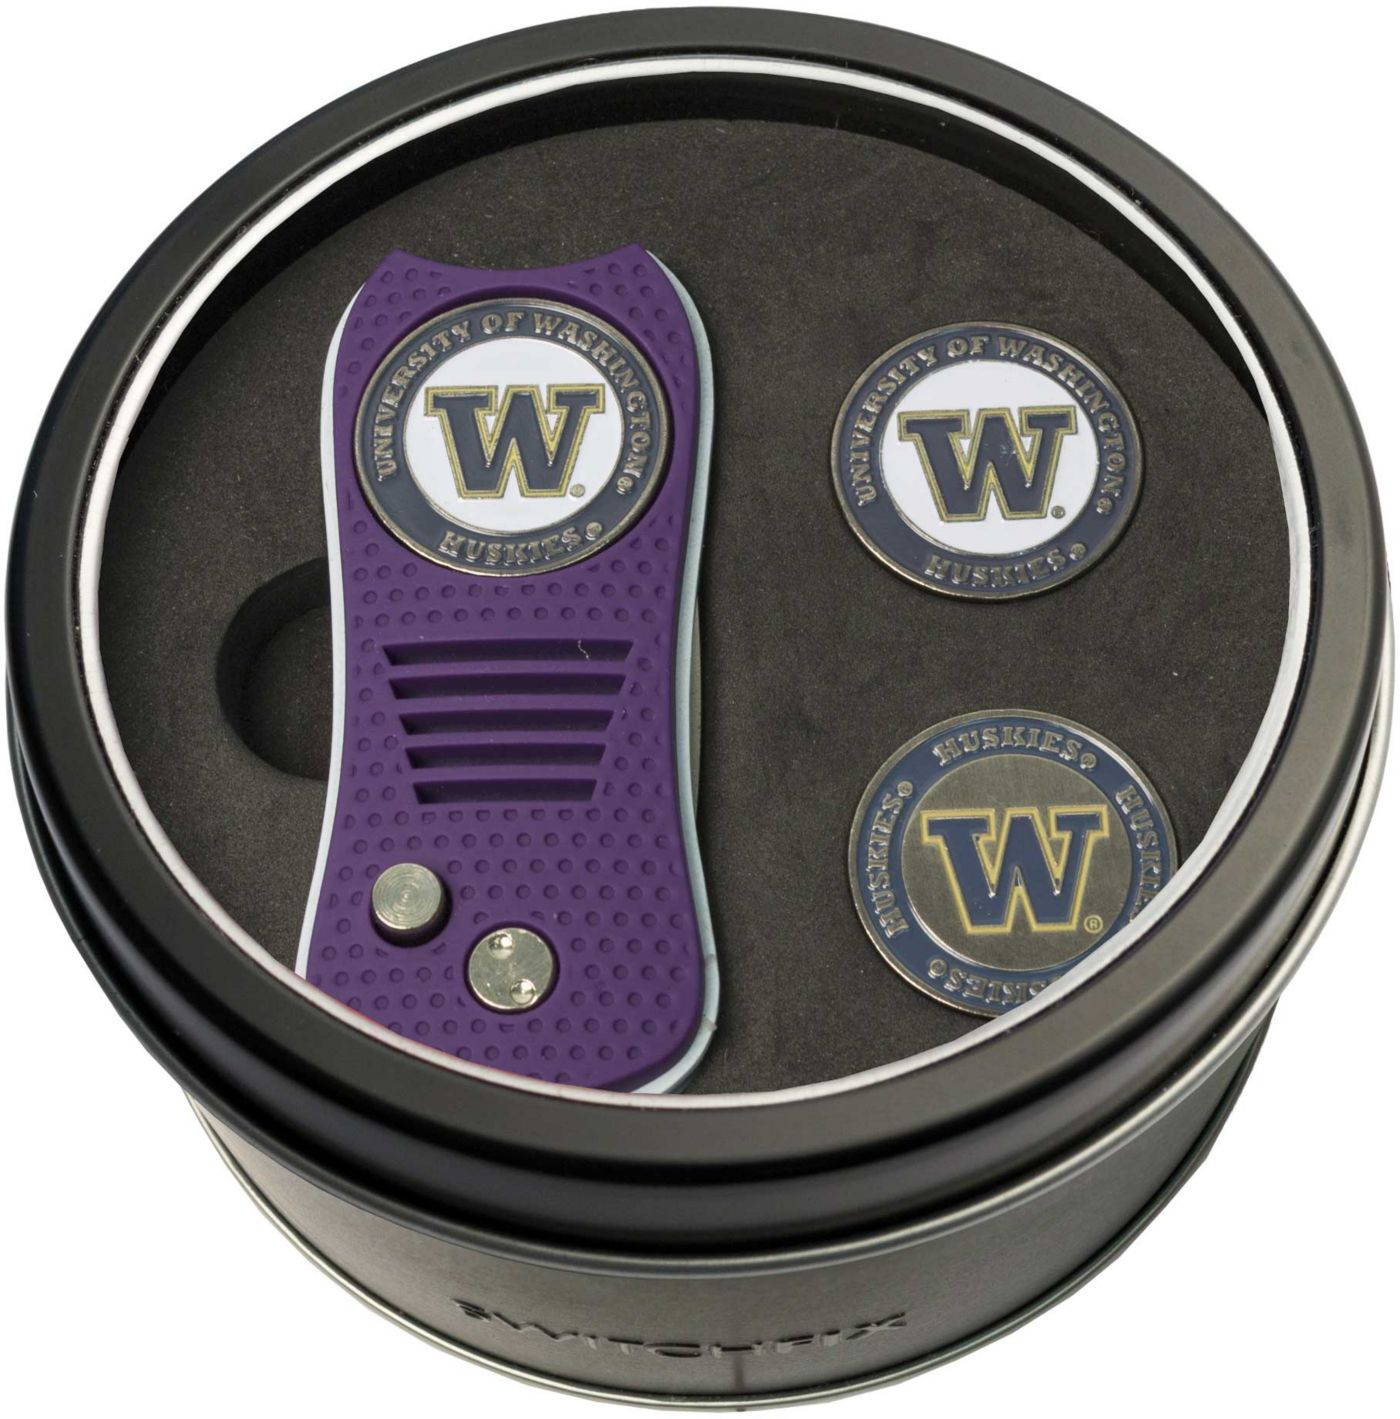 Team Golf Washington Huskies Switchfix Divot Tool and Ball Markers Set